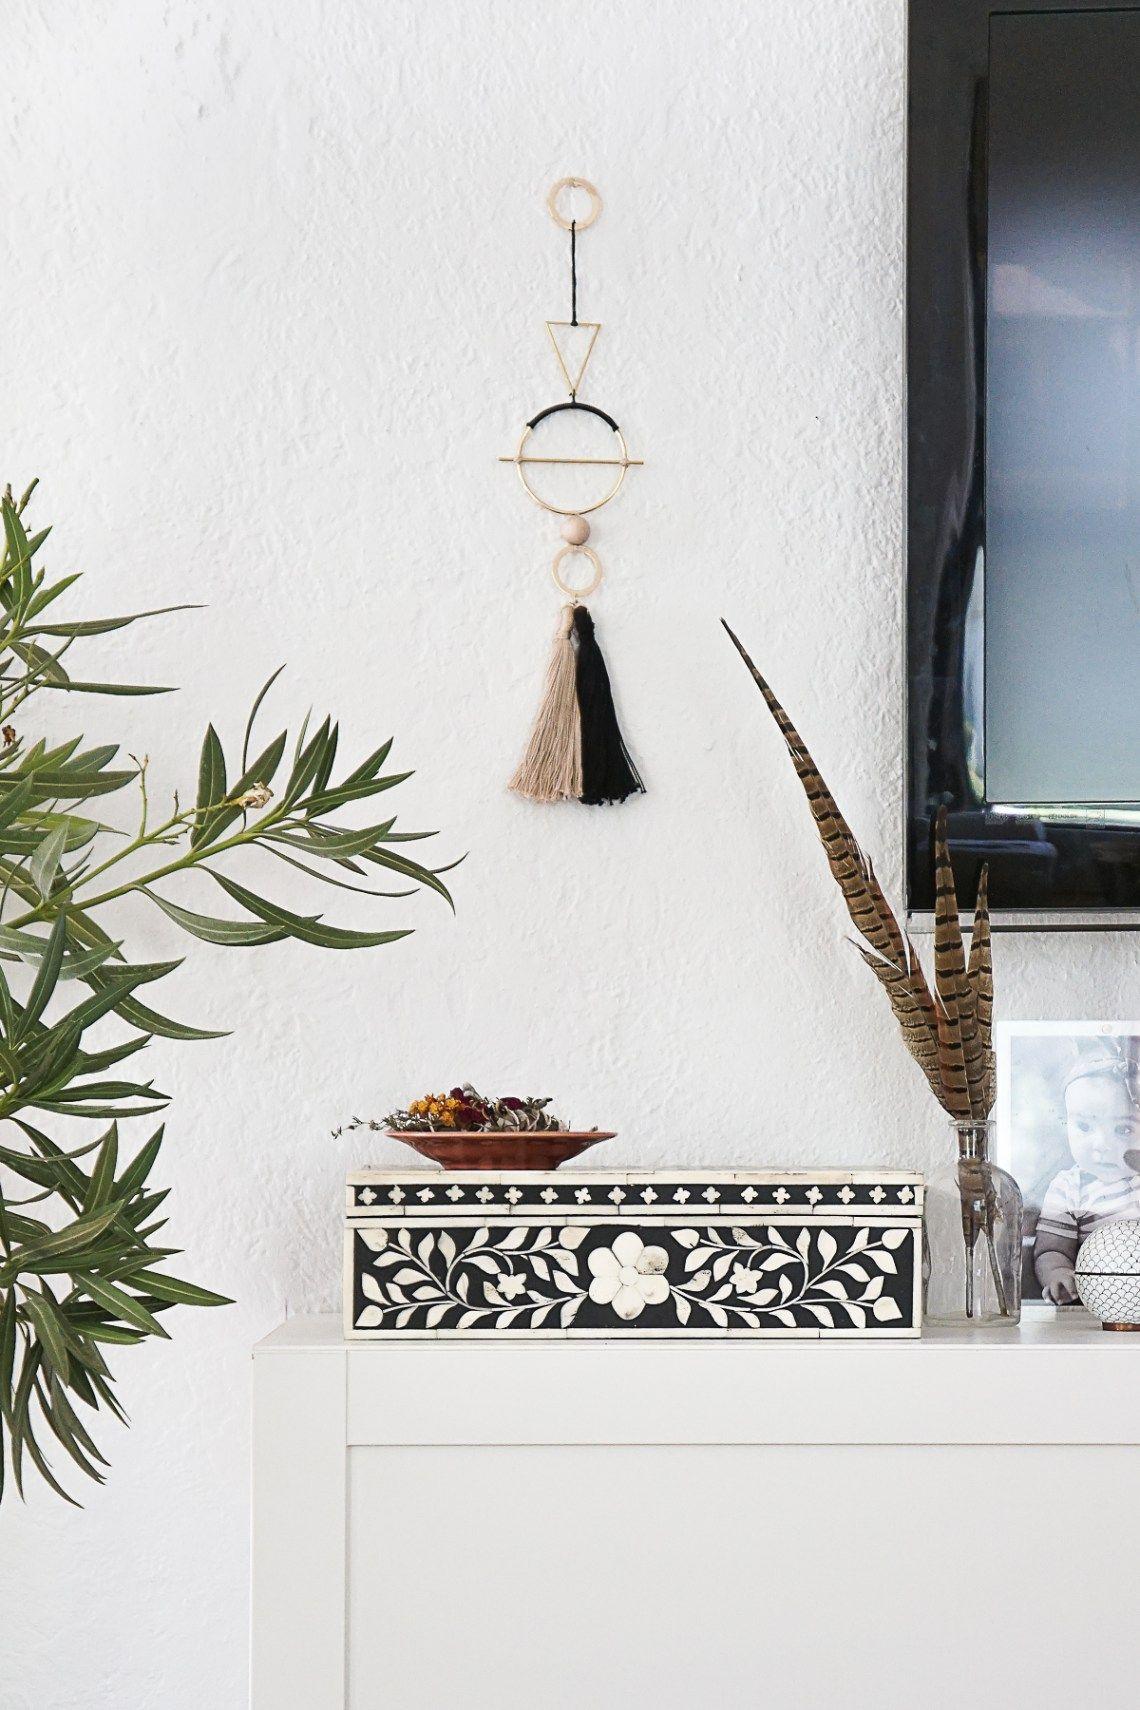 Global style feel good design with meridian artisan interiors